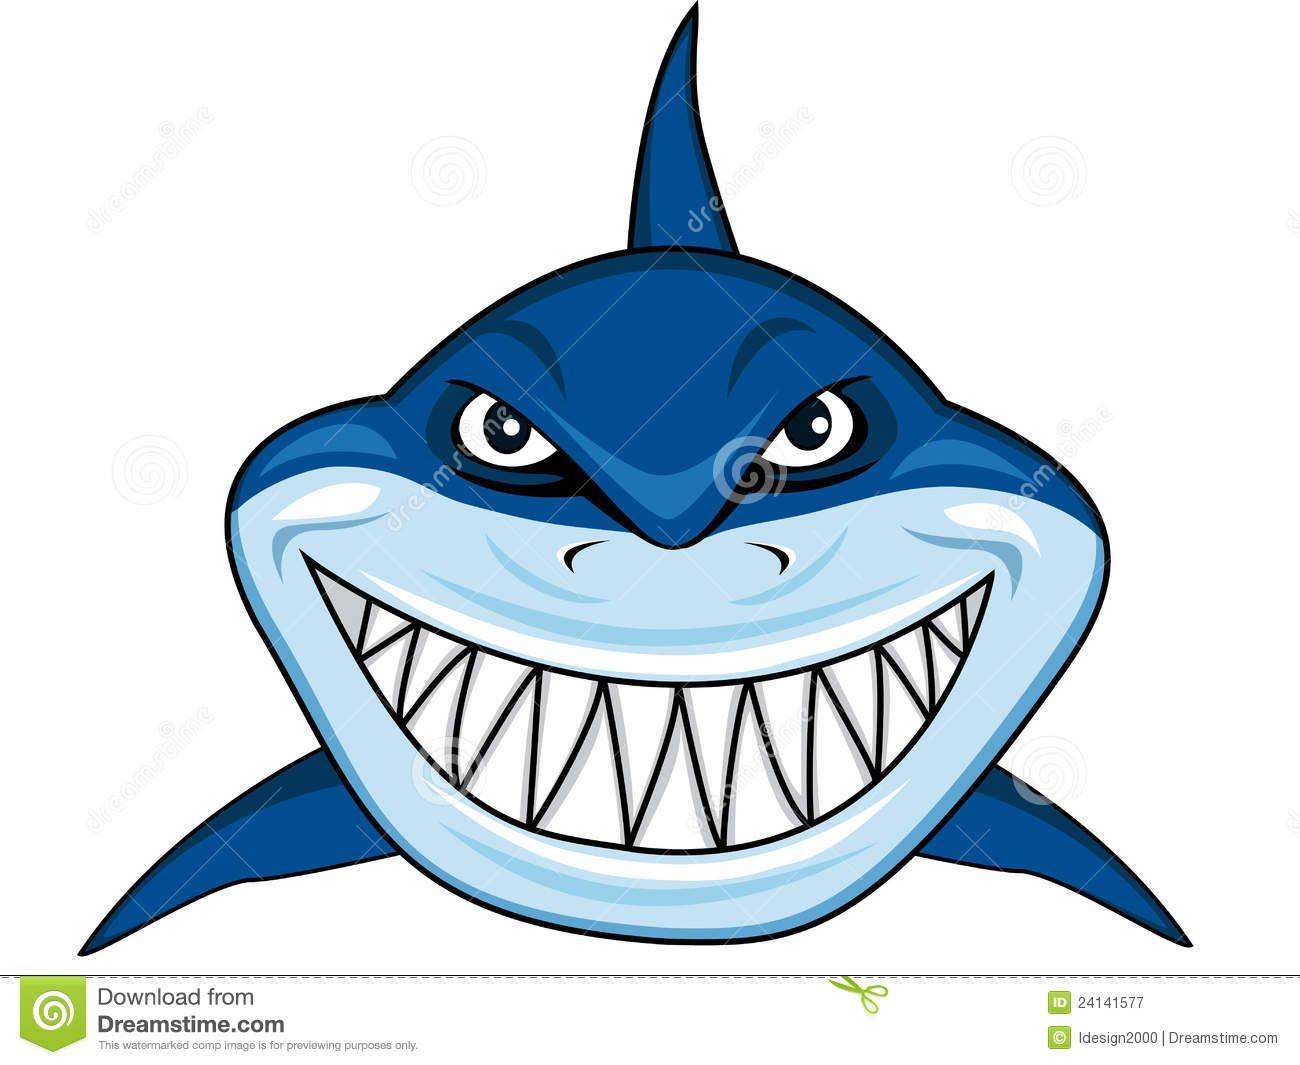 Free clipart of shark eyes and teeth svg freeuse stock Shark Fin Illustration | Clipart Panda - Free Clipart Images | swim ... svg freeuse stock